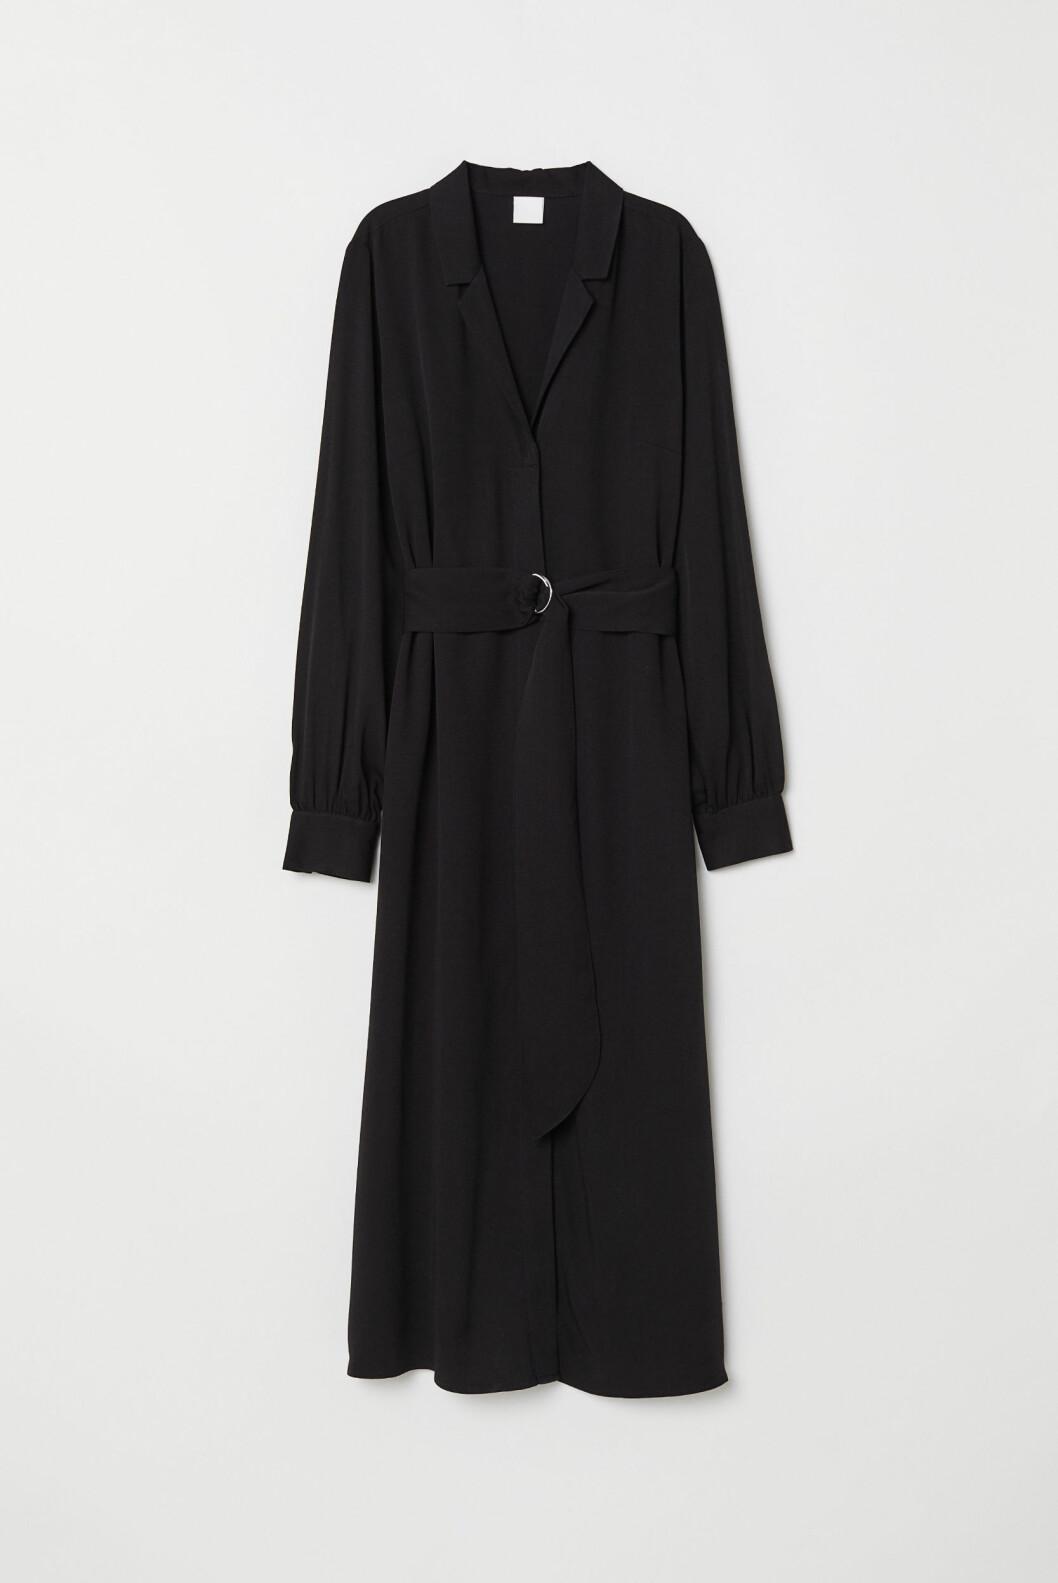 Kjole fra H&M |300,-| https://www2.hm.com/no_no/productpage.0717779001.html